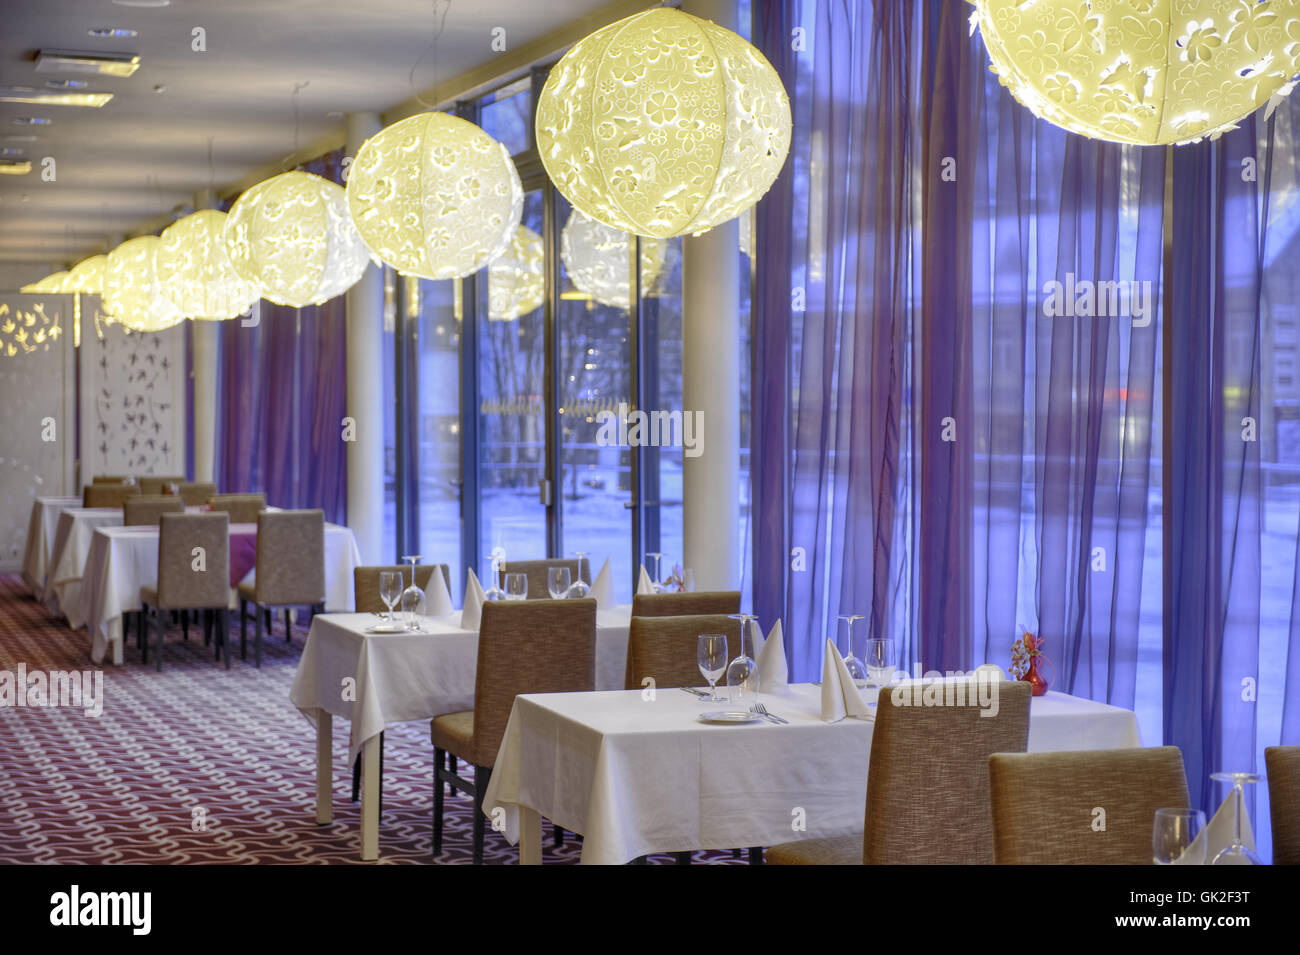 interior decoration restaurant stock photos & interior decoration